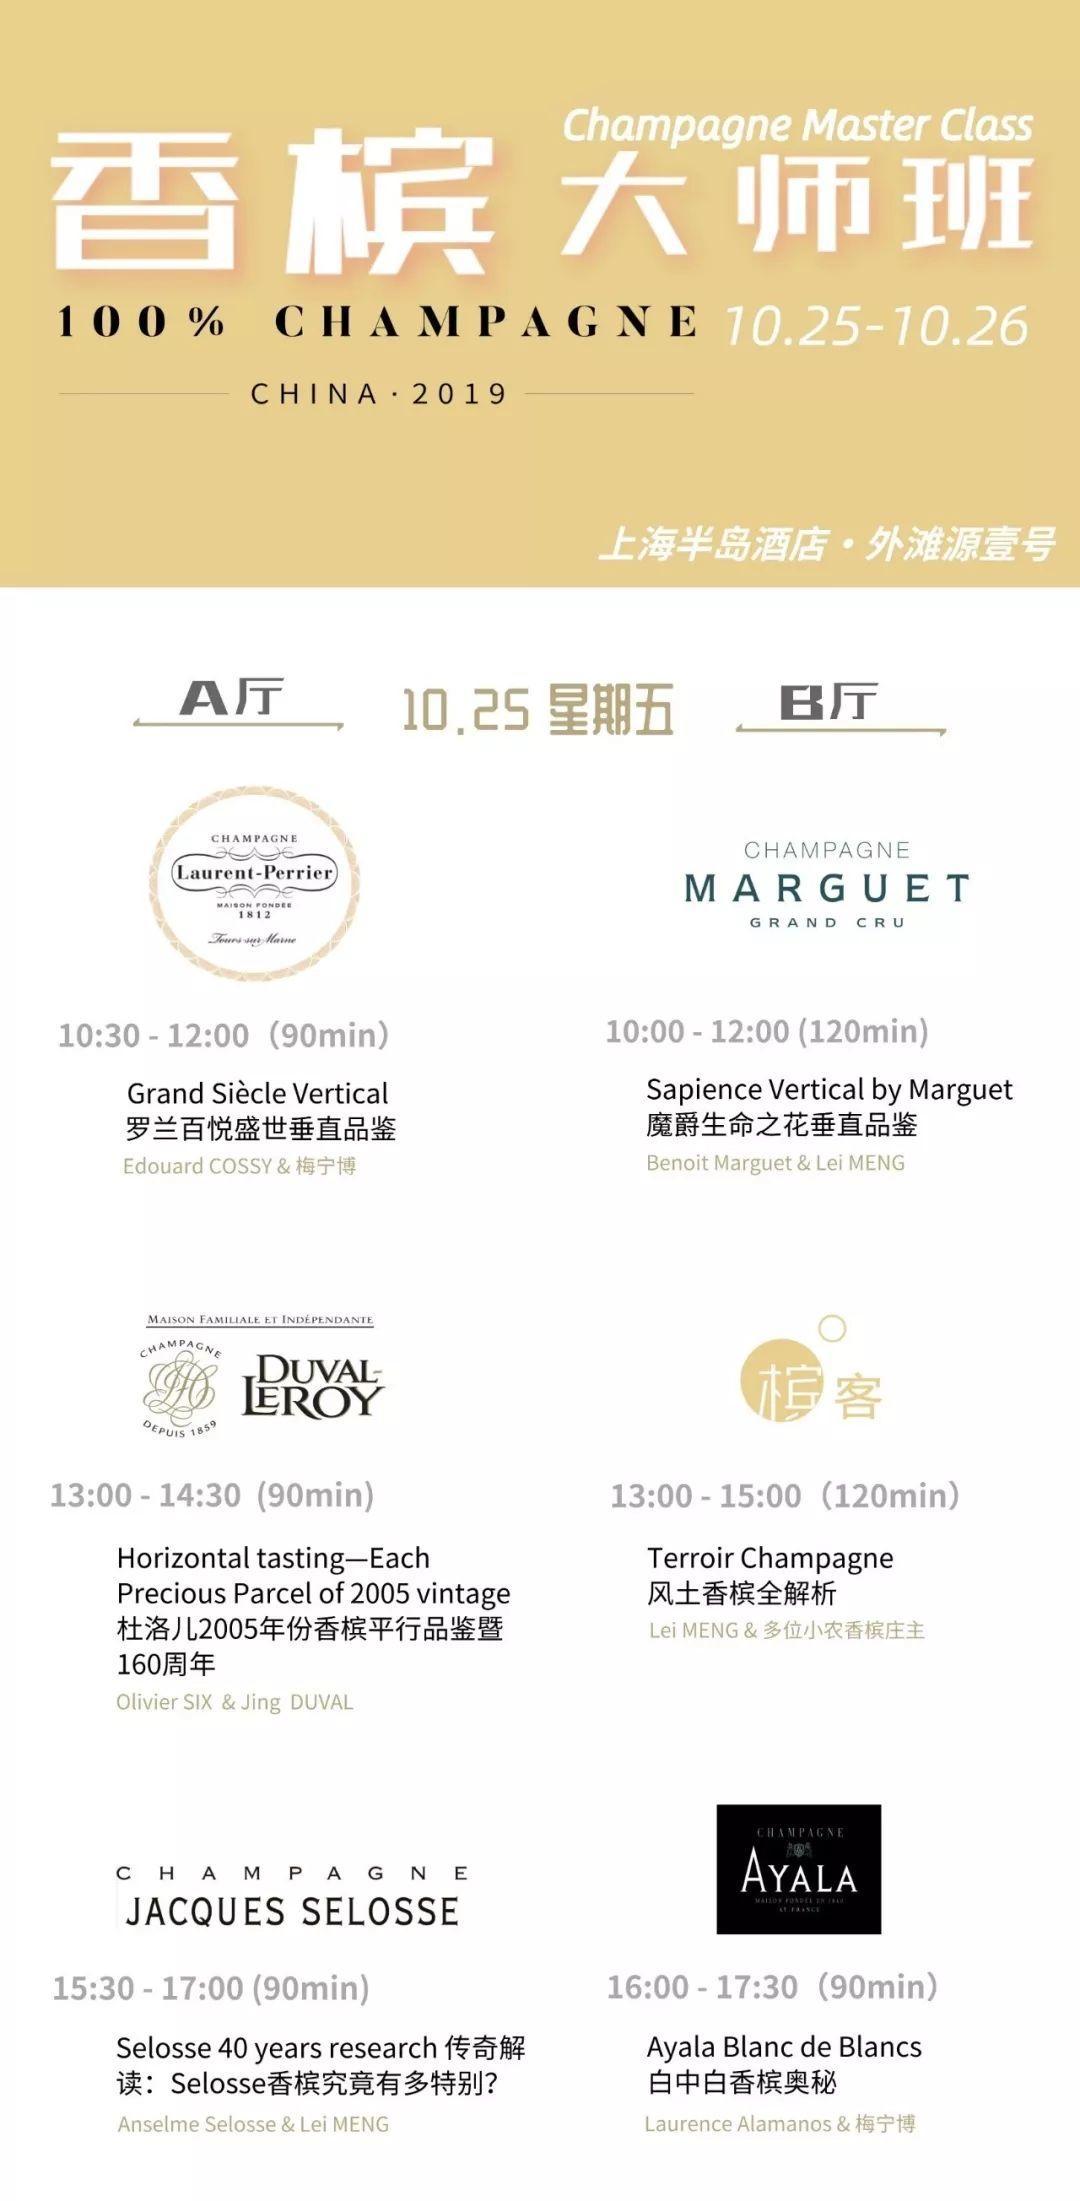 50个香槟品牌! 第二届全香槟酒展倒计时 100% CHAMPAGNE China 2019